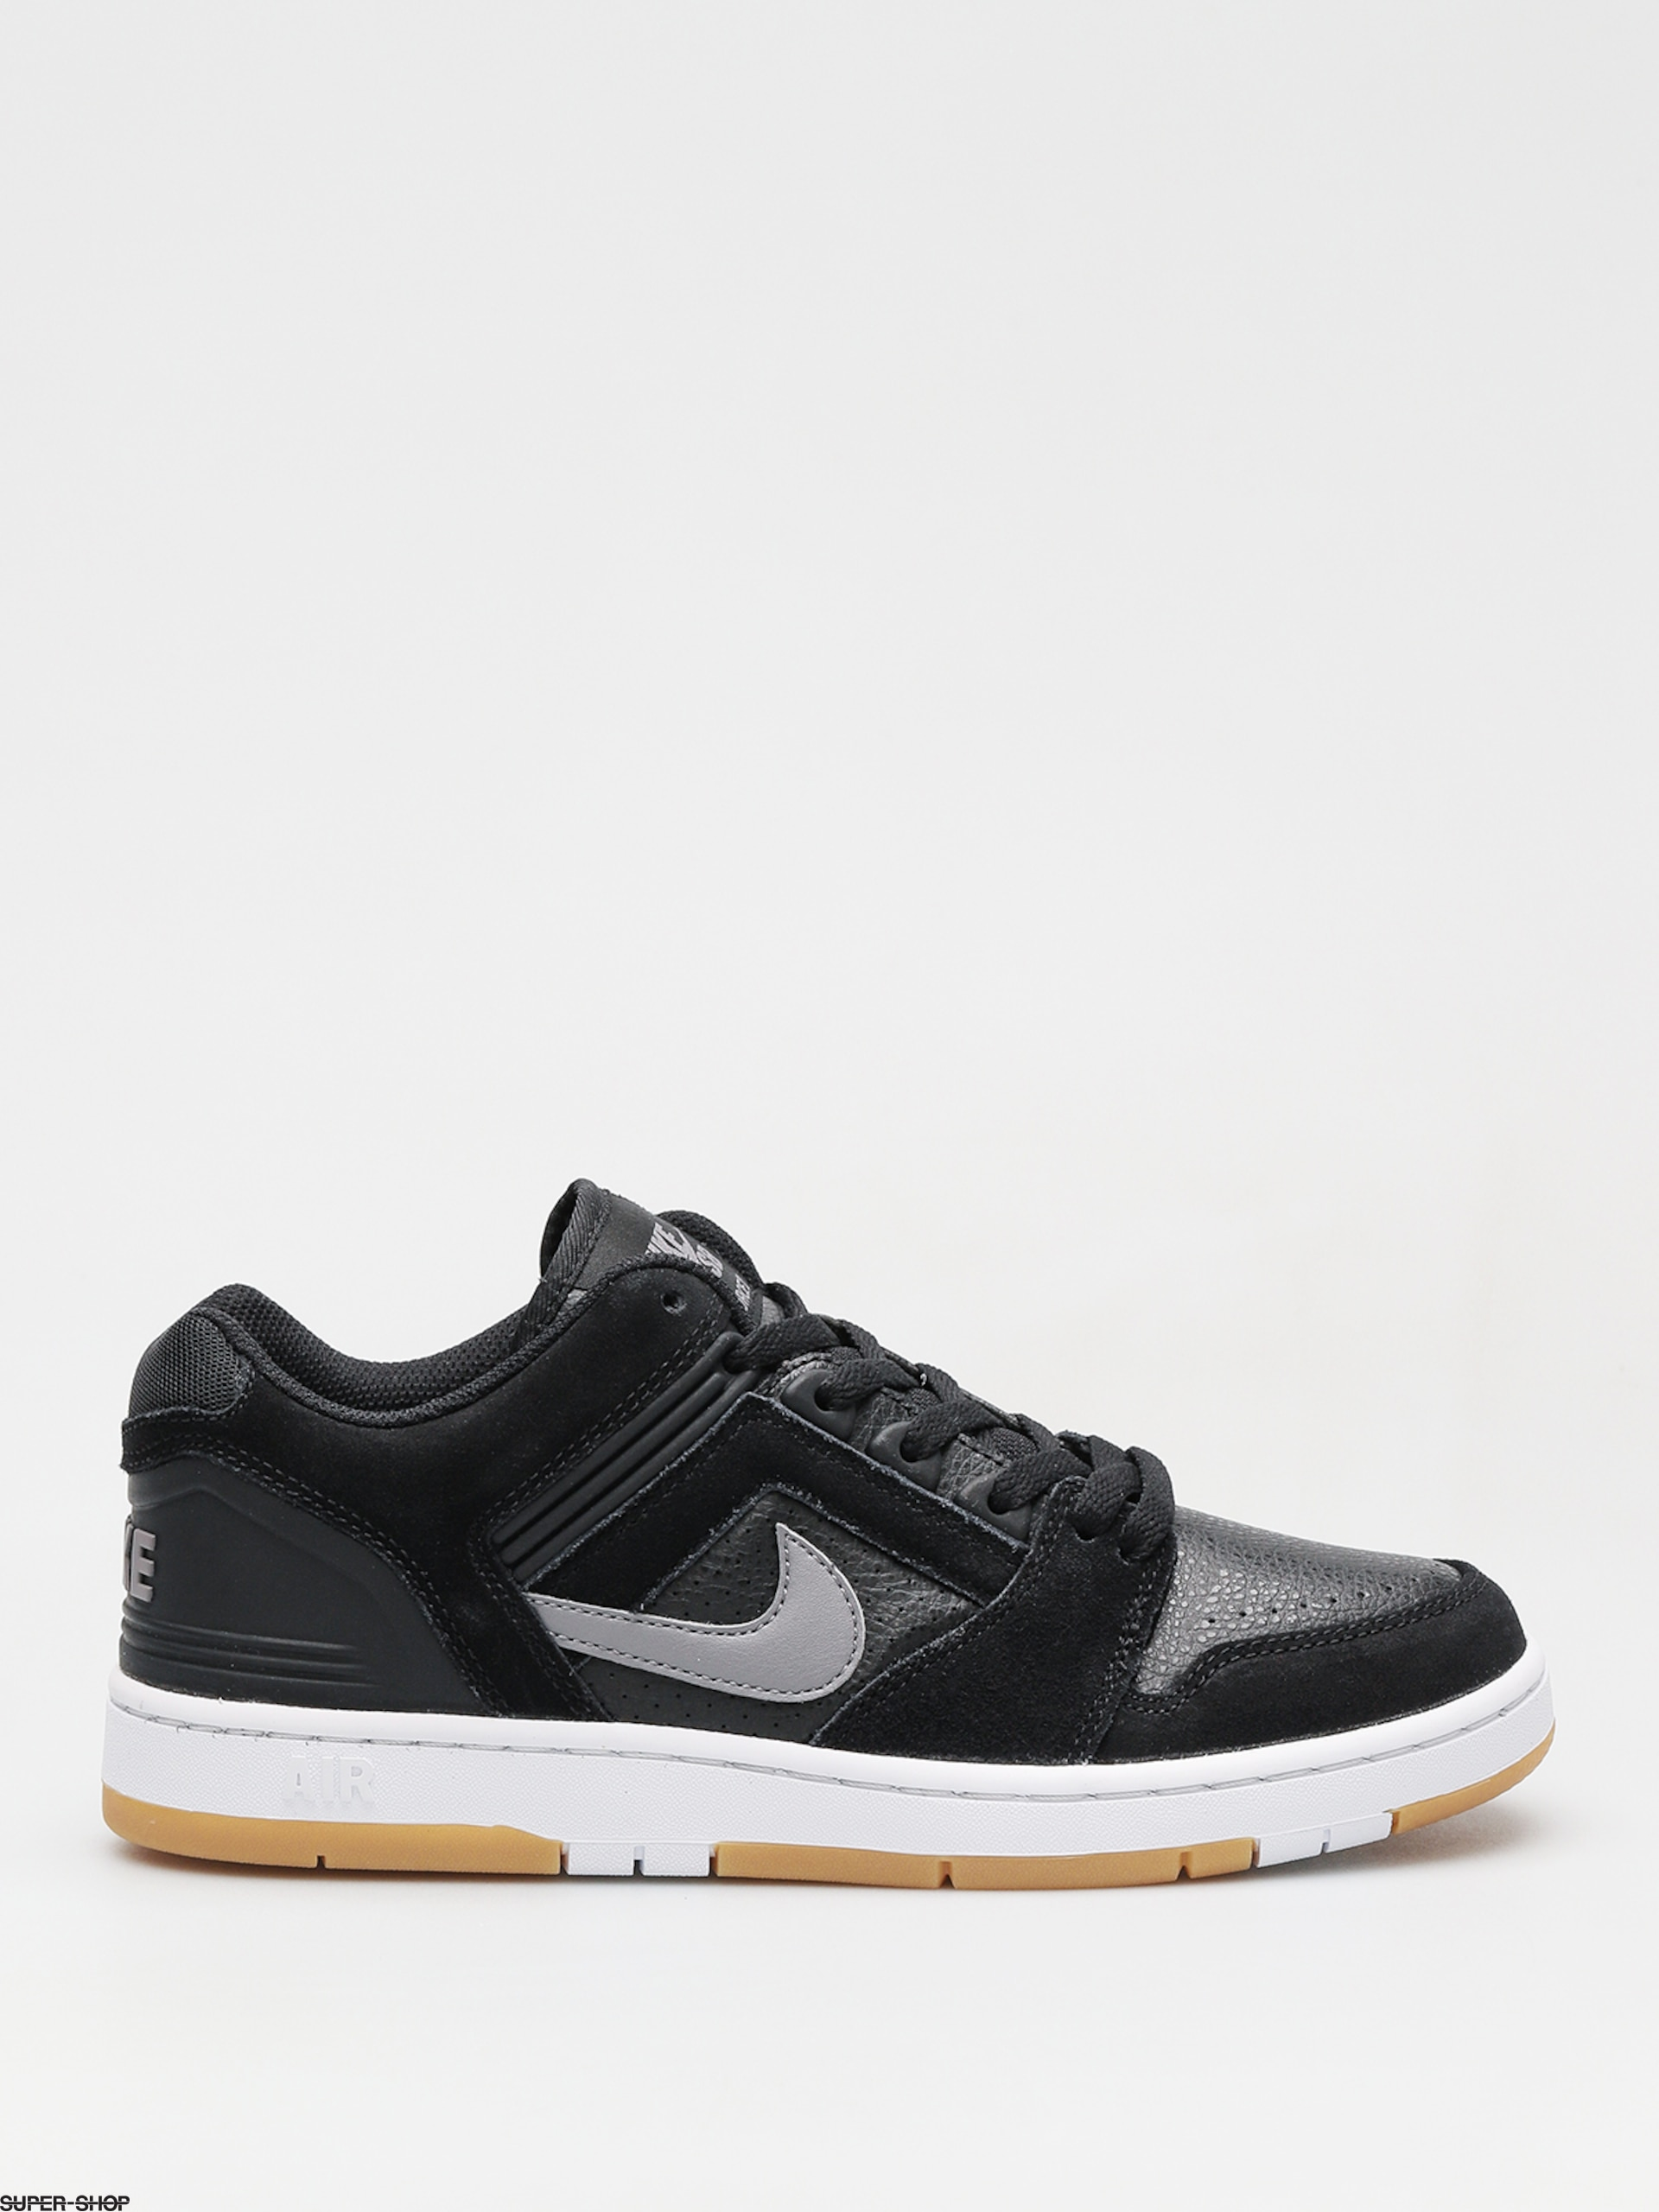 a4d47e2238e Nike SB Sb Air Force II Low Shoes (black gunsmoke white gum light brown)